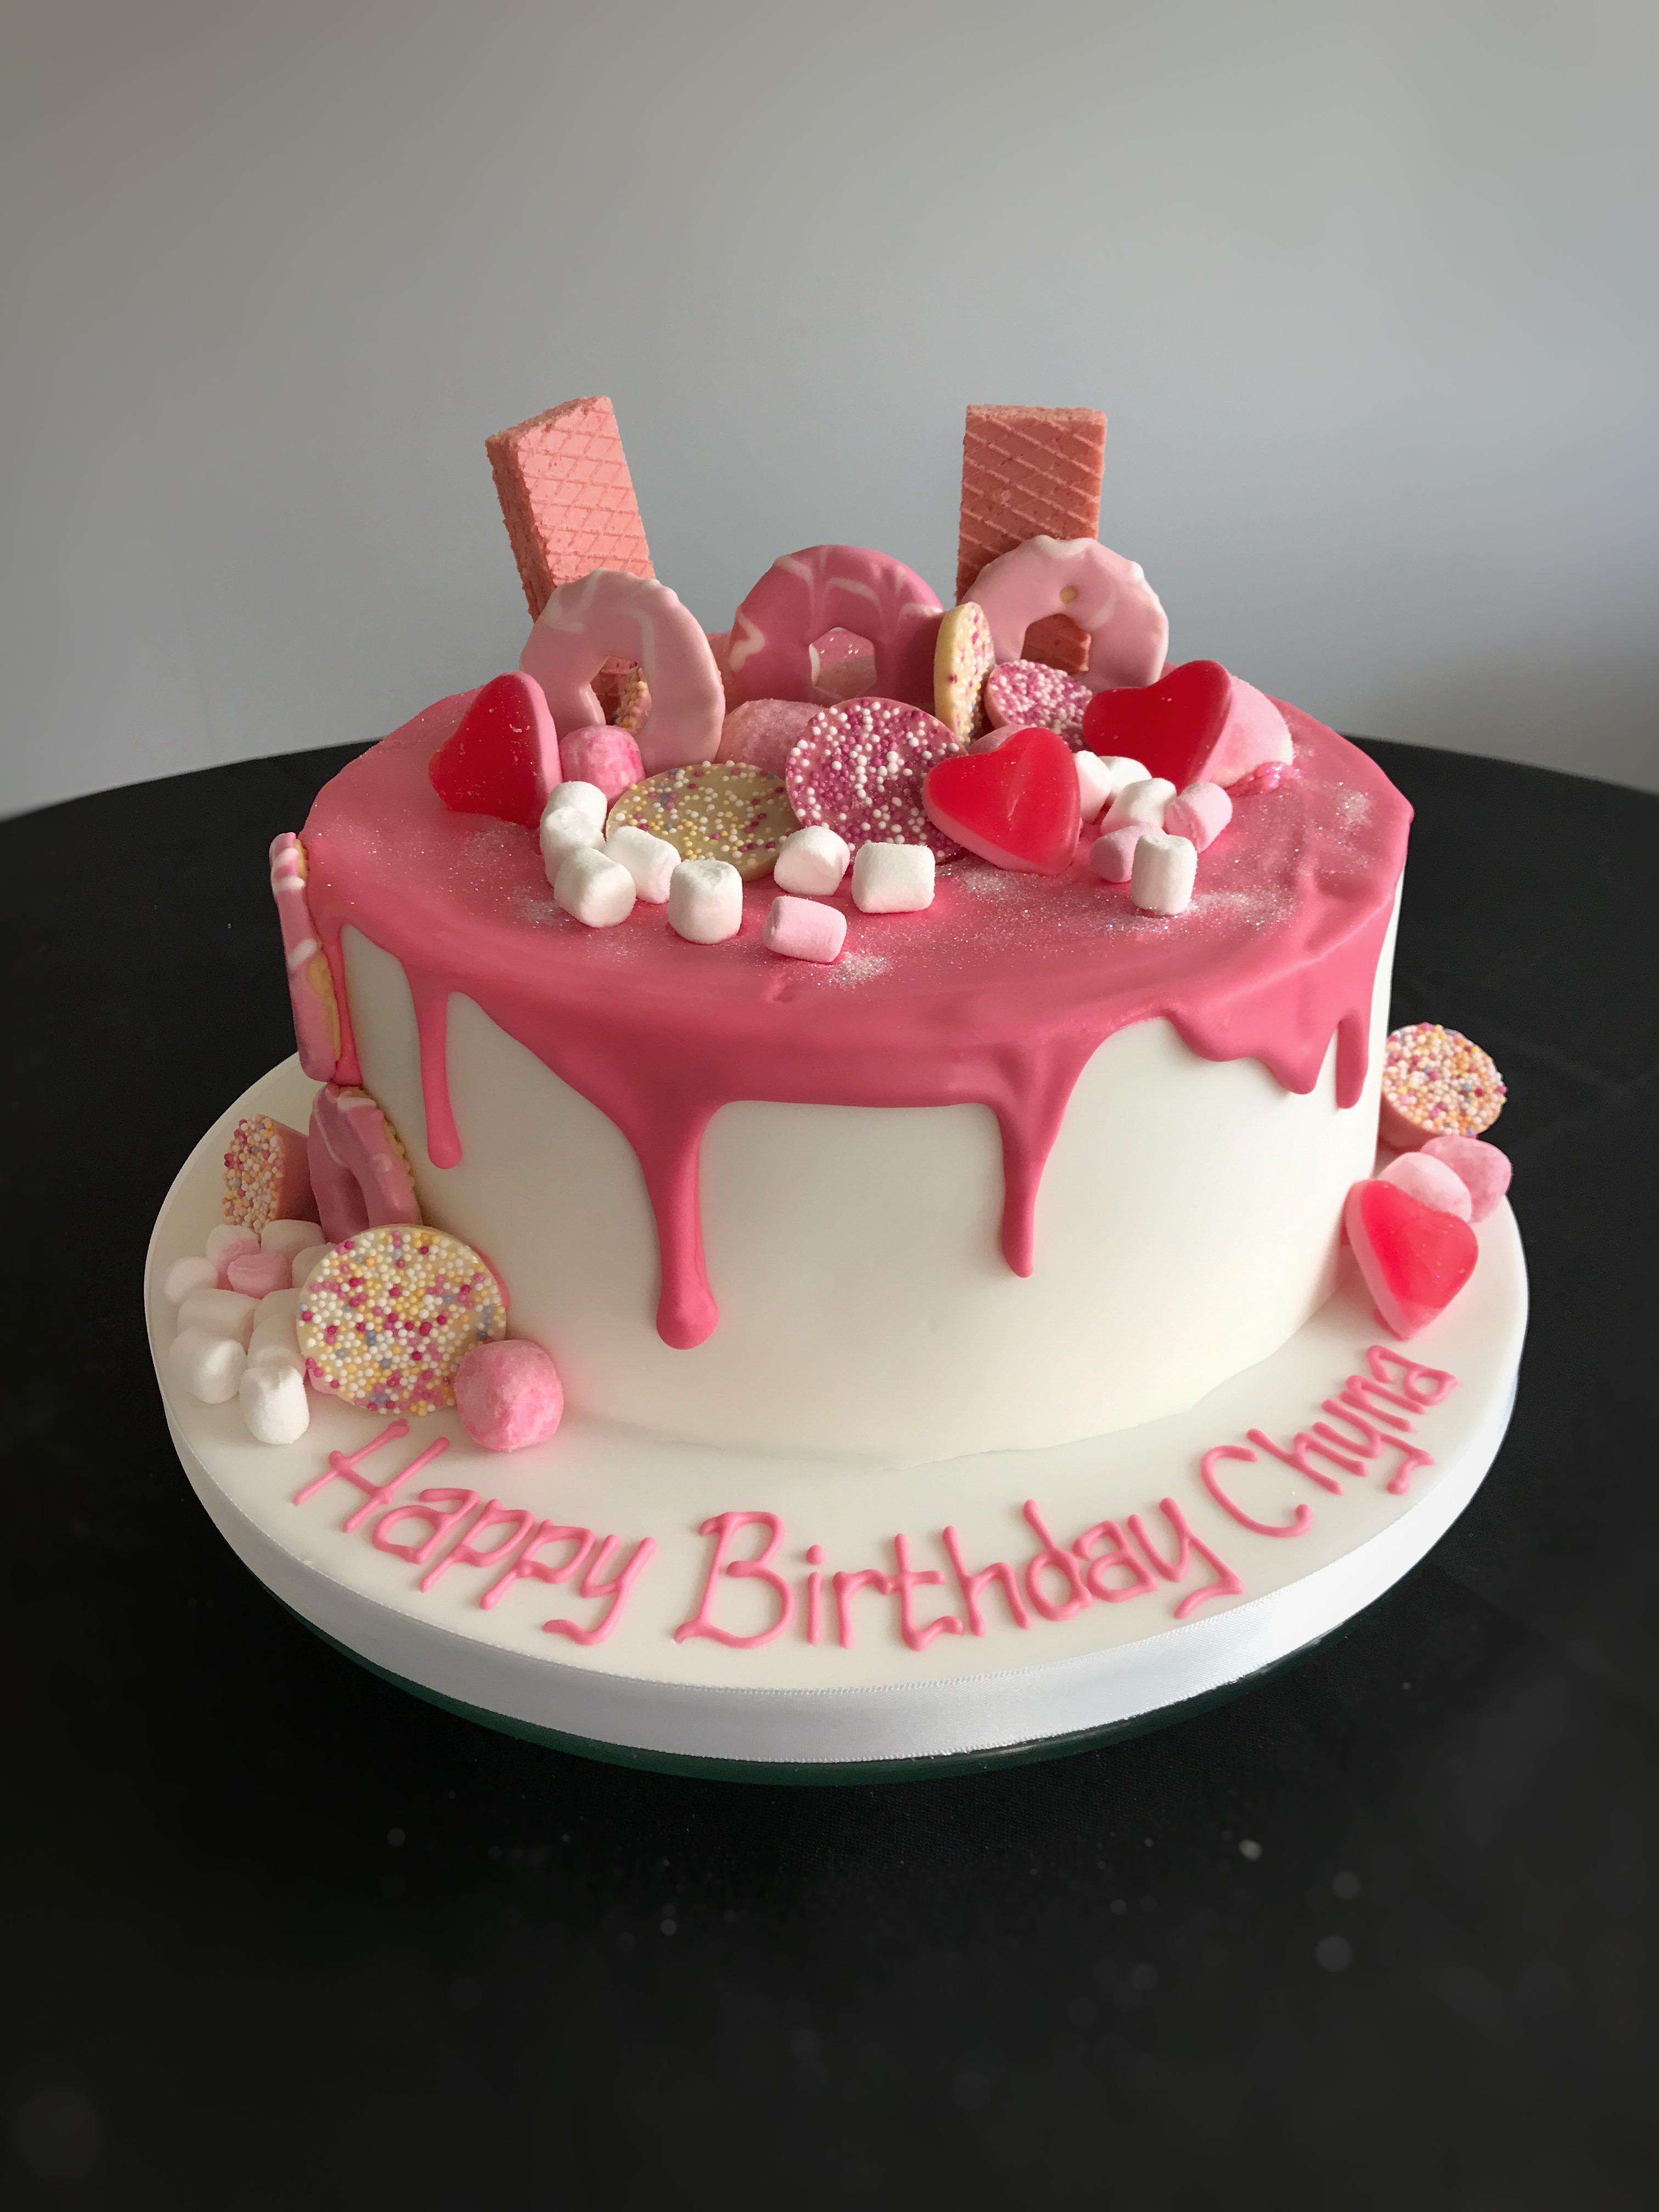 Ideas For 50th Birthday Cake For Female A 50th Birthday